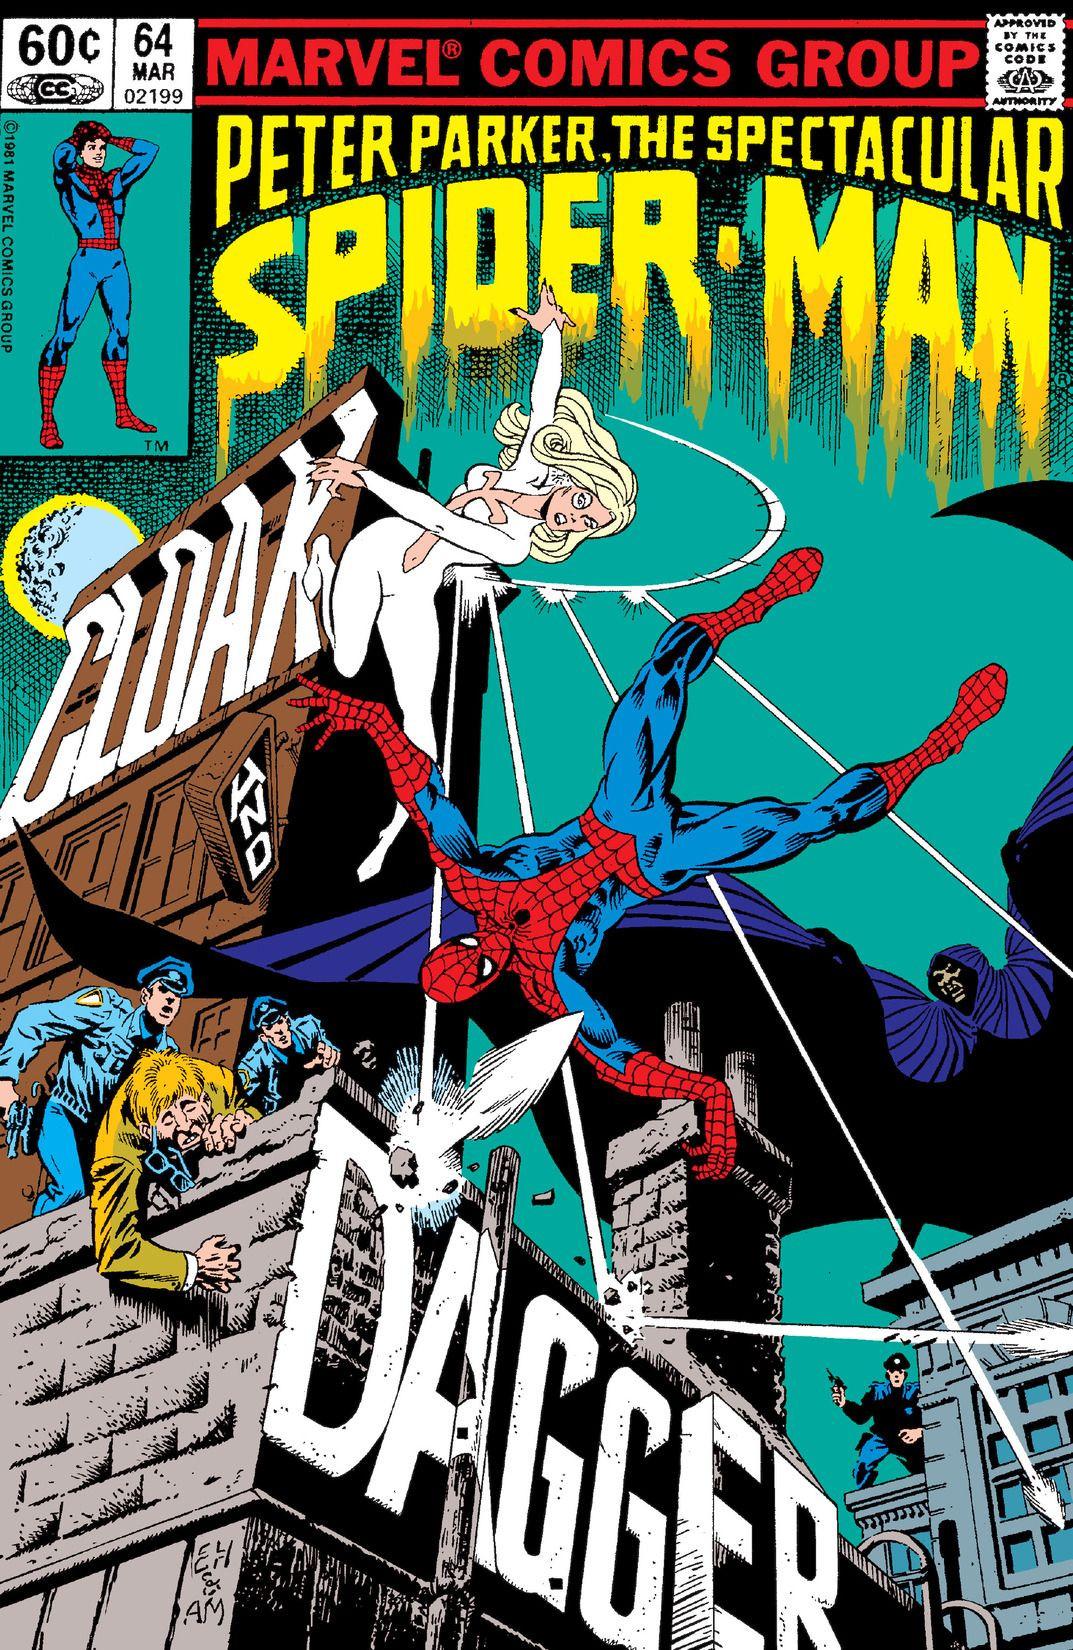 Peter Parker, The Spectacular Spider-Man Vol 1 64